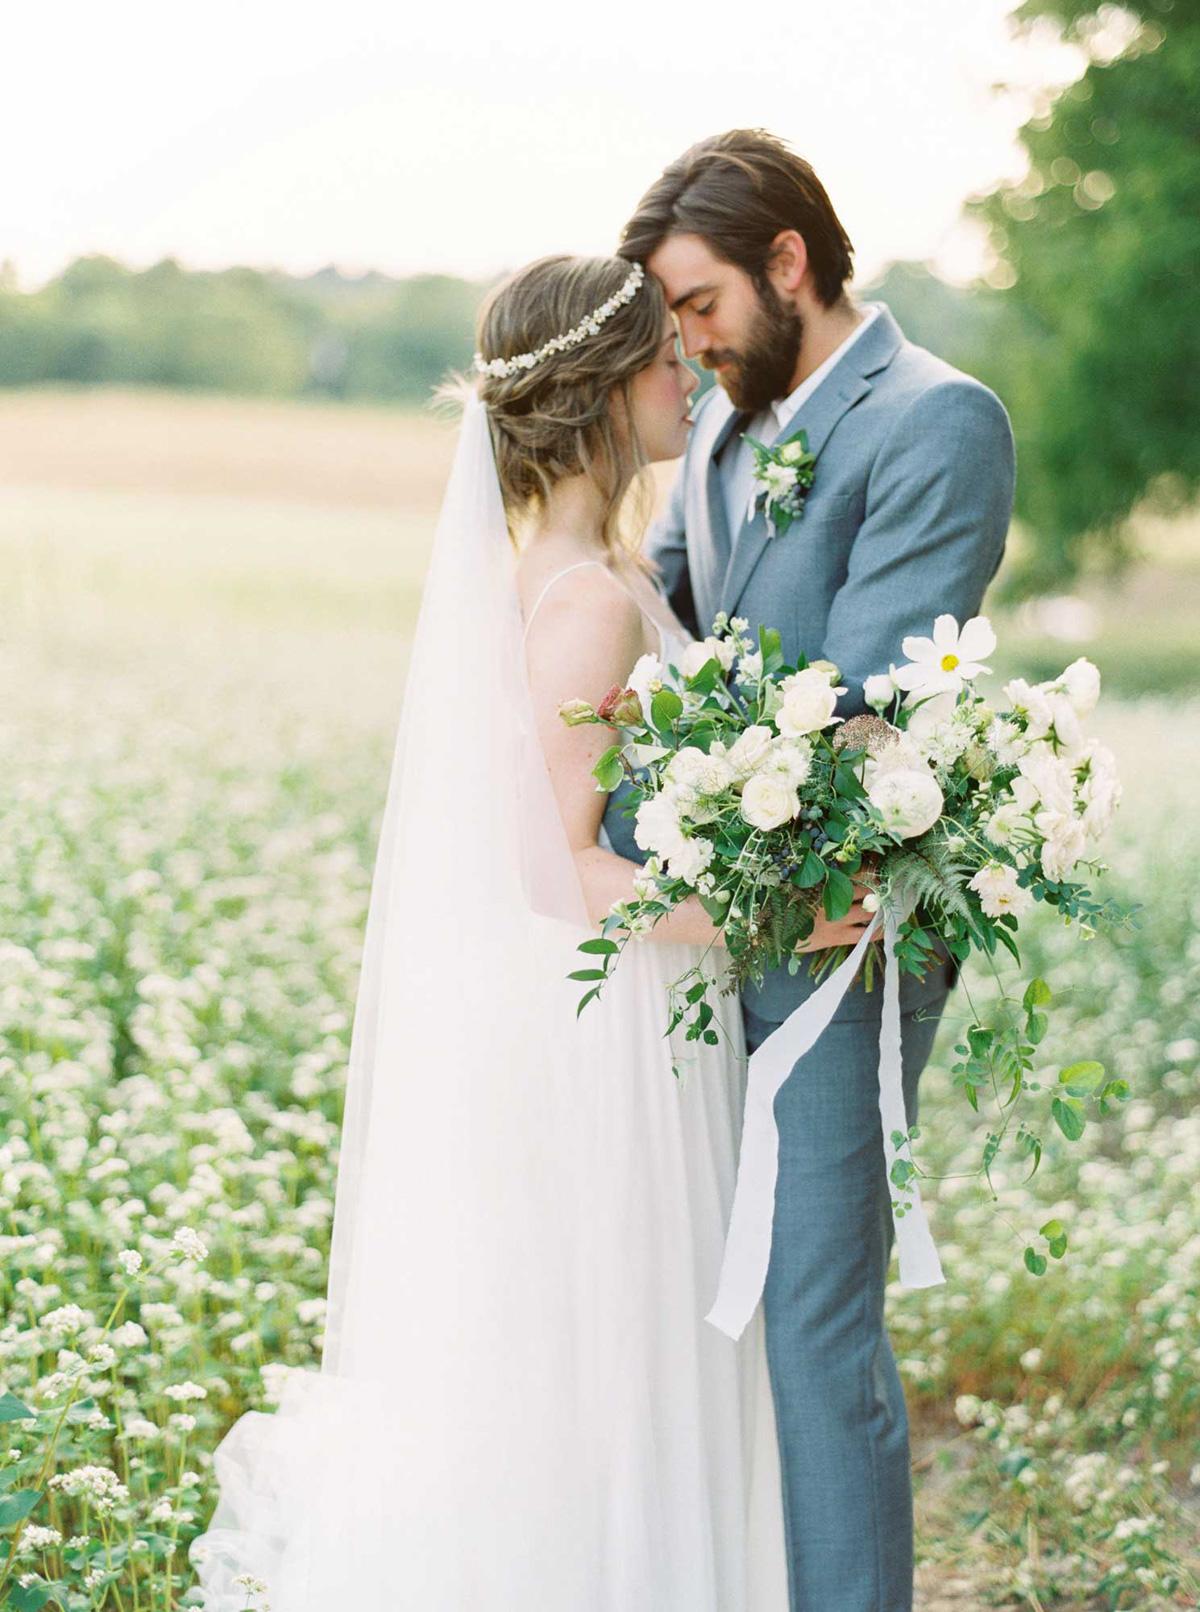 kayla-yestal-vineyard-bride-swish-list-woodland-weddings-niagara-wedding-editorial-30.jpg